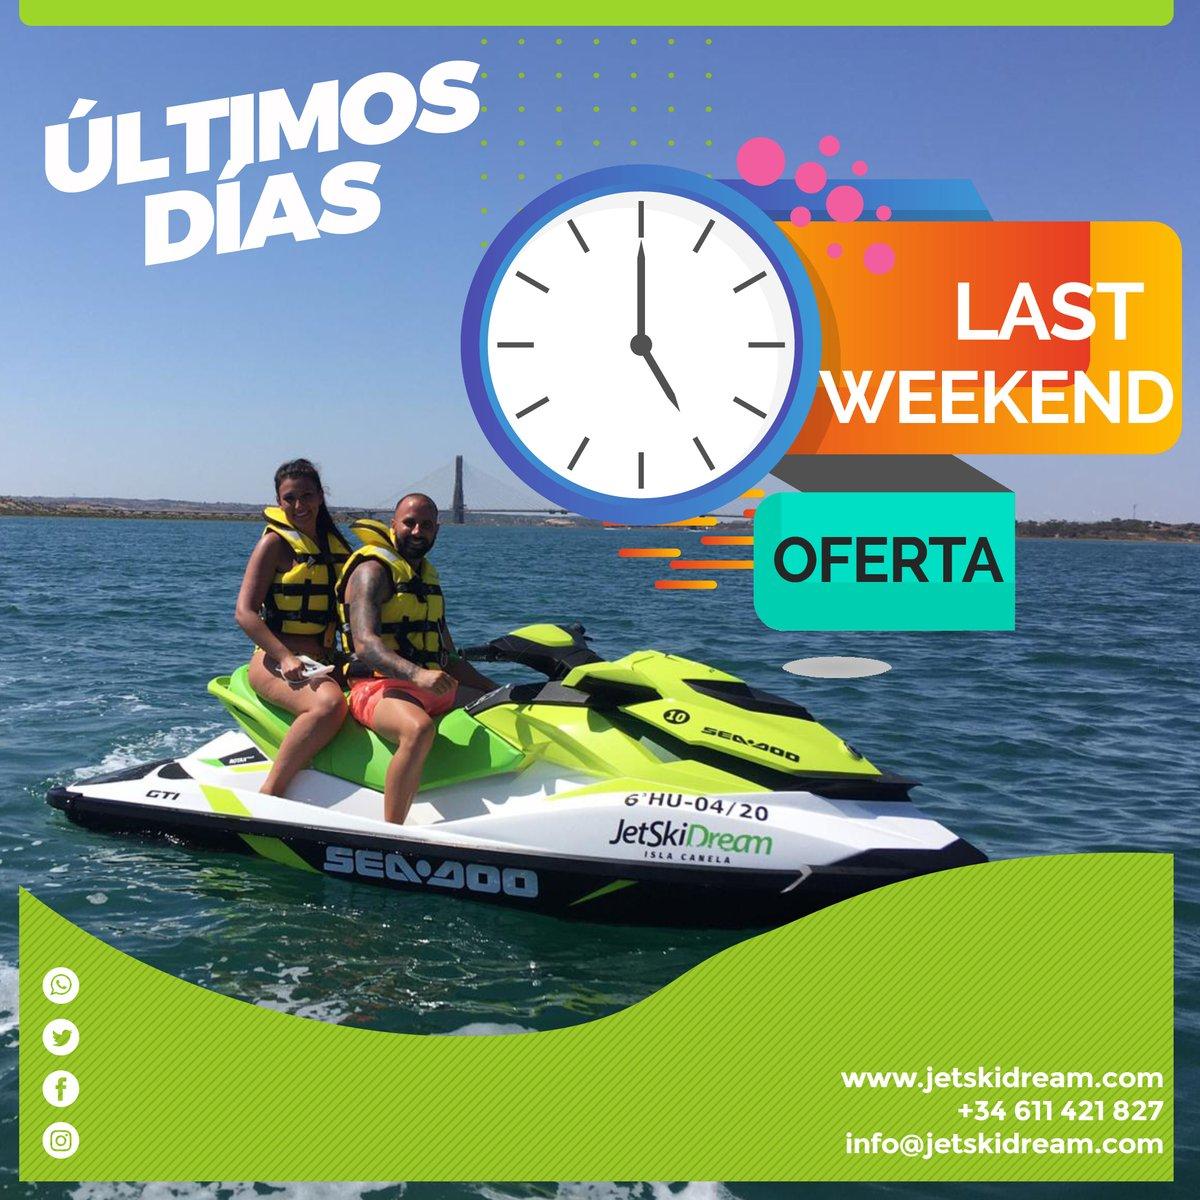 Último #findesemana de la temporada!! 😢 🌊 Tranquilo, aún puedes disfrutar de la #JetSkiDreamExperience. Nos vamos a despedir a lo grande!!😉⠀  Reservas:⠀ 🌐 https://t.co/3C3dNRRJEF⠀  #JetSkiDream #motodeagua #JetSki #jetskilife #SeaDoo #motosdeaguahuelva #Huelva https://t.co/26Su6ZYXHr